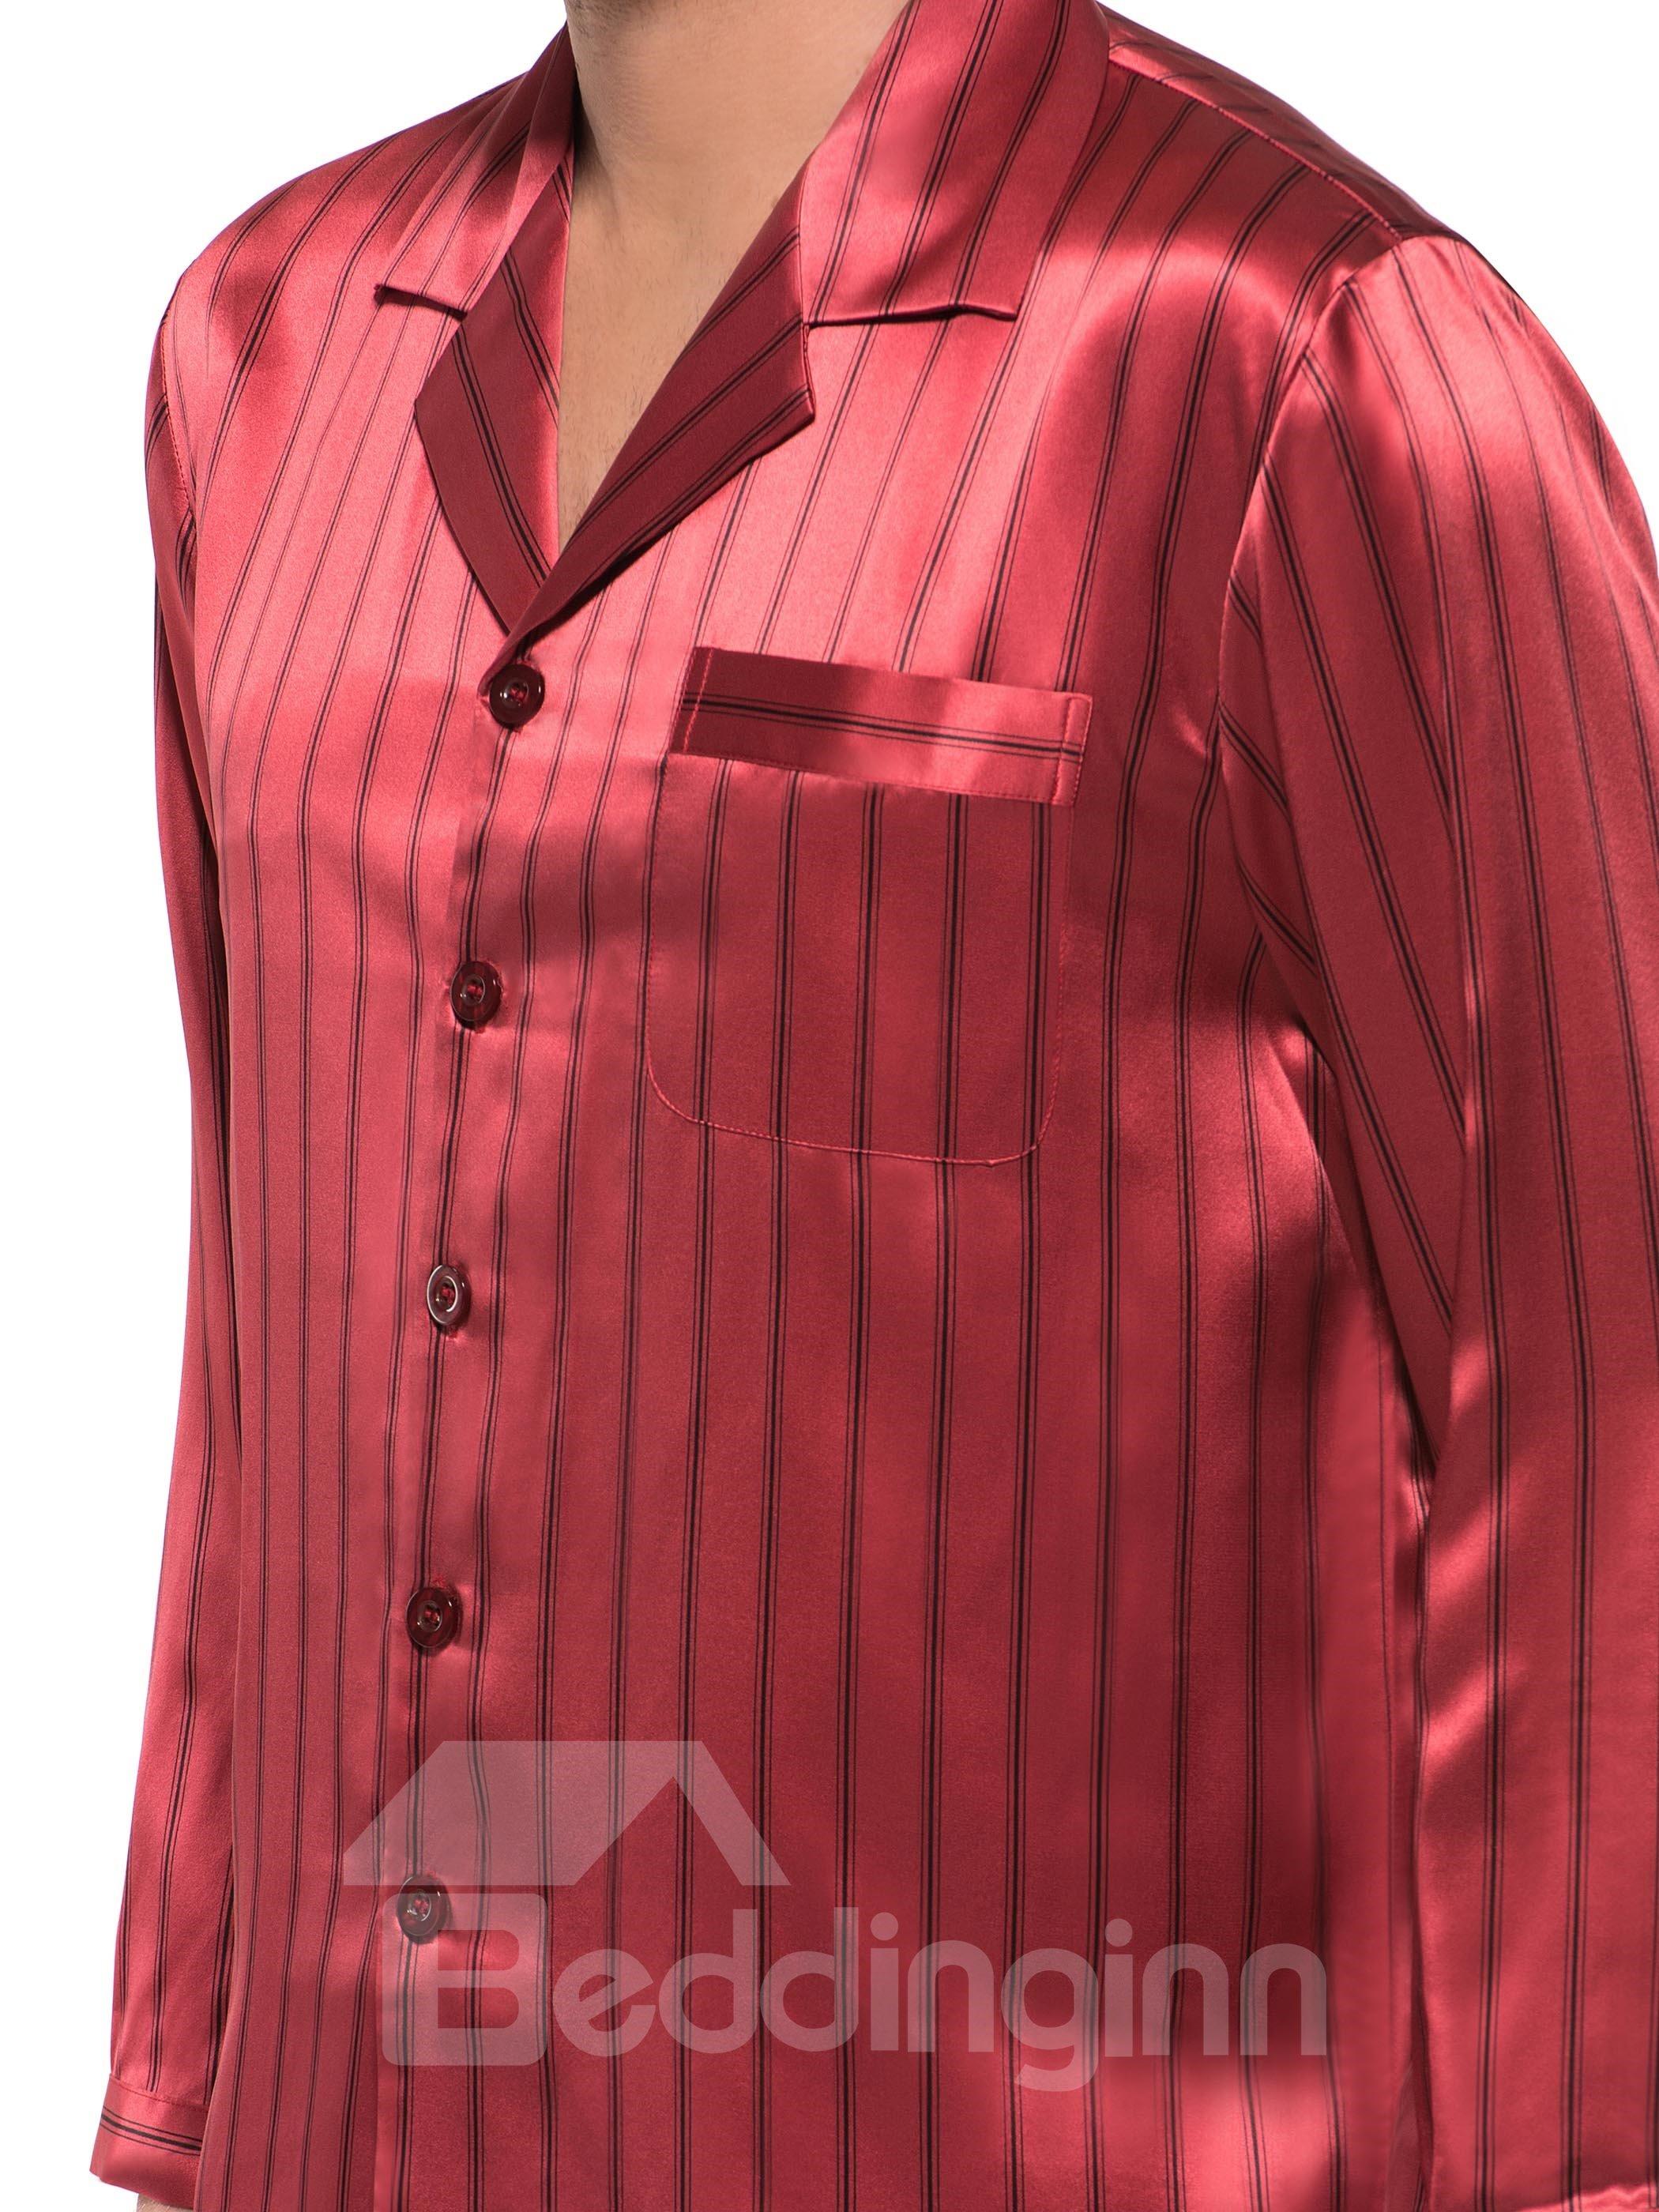 Luxury Burgundy Stripes Open Collar Long Sleeve Silk Pajamas